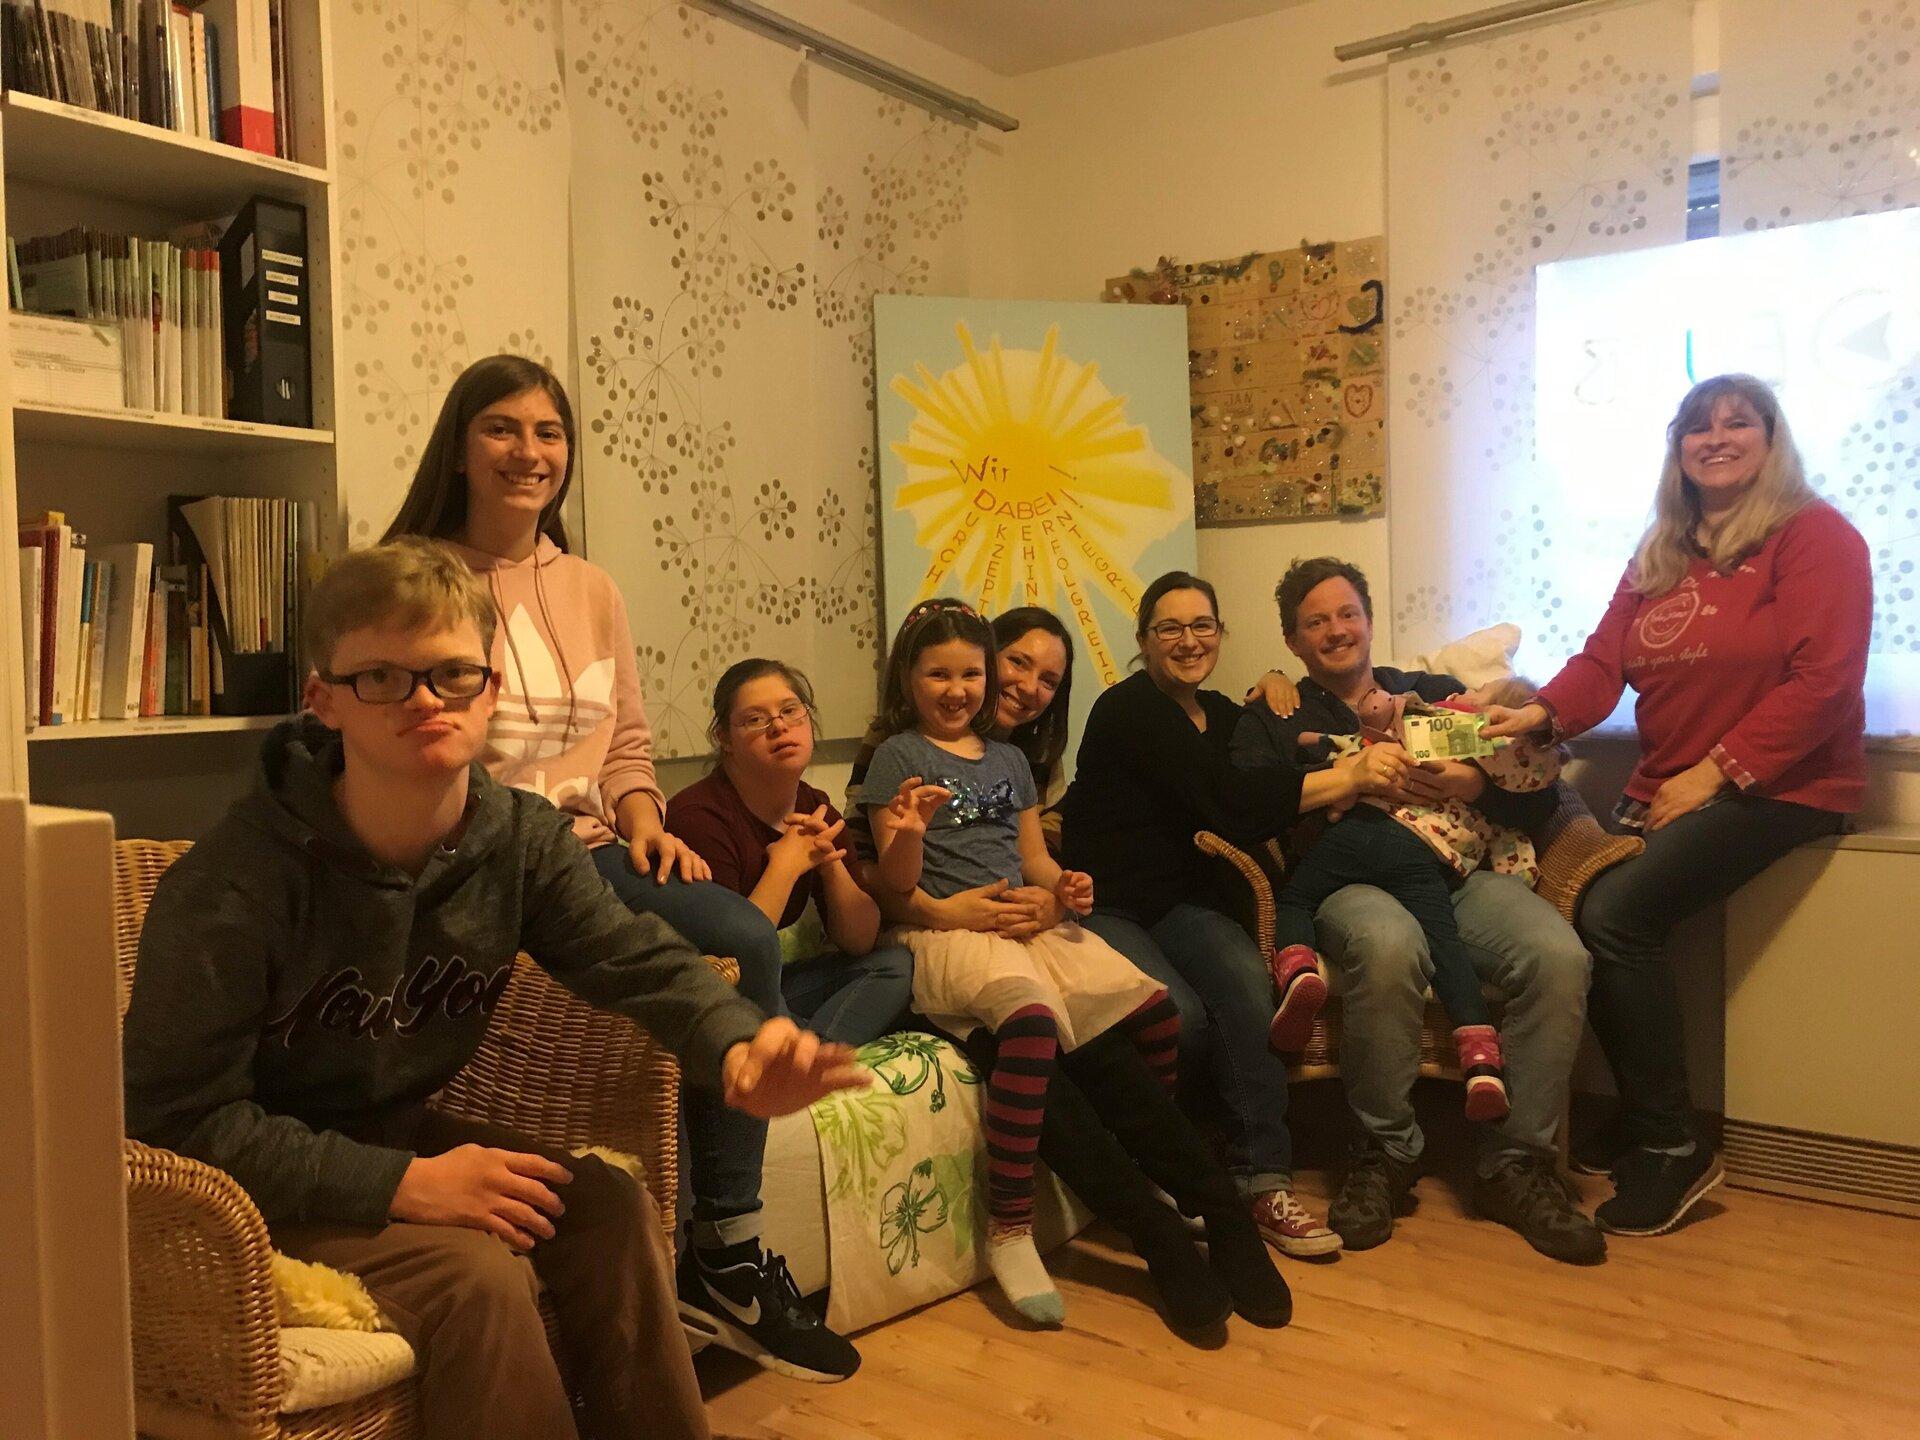 Simon und Carolin Doering, Maja Hoffmann, Paula und Christina Luhn, Tanja und Thorsten Bruns und Petra Doering